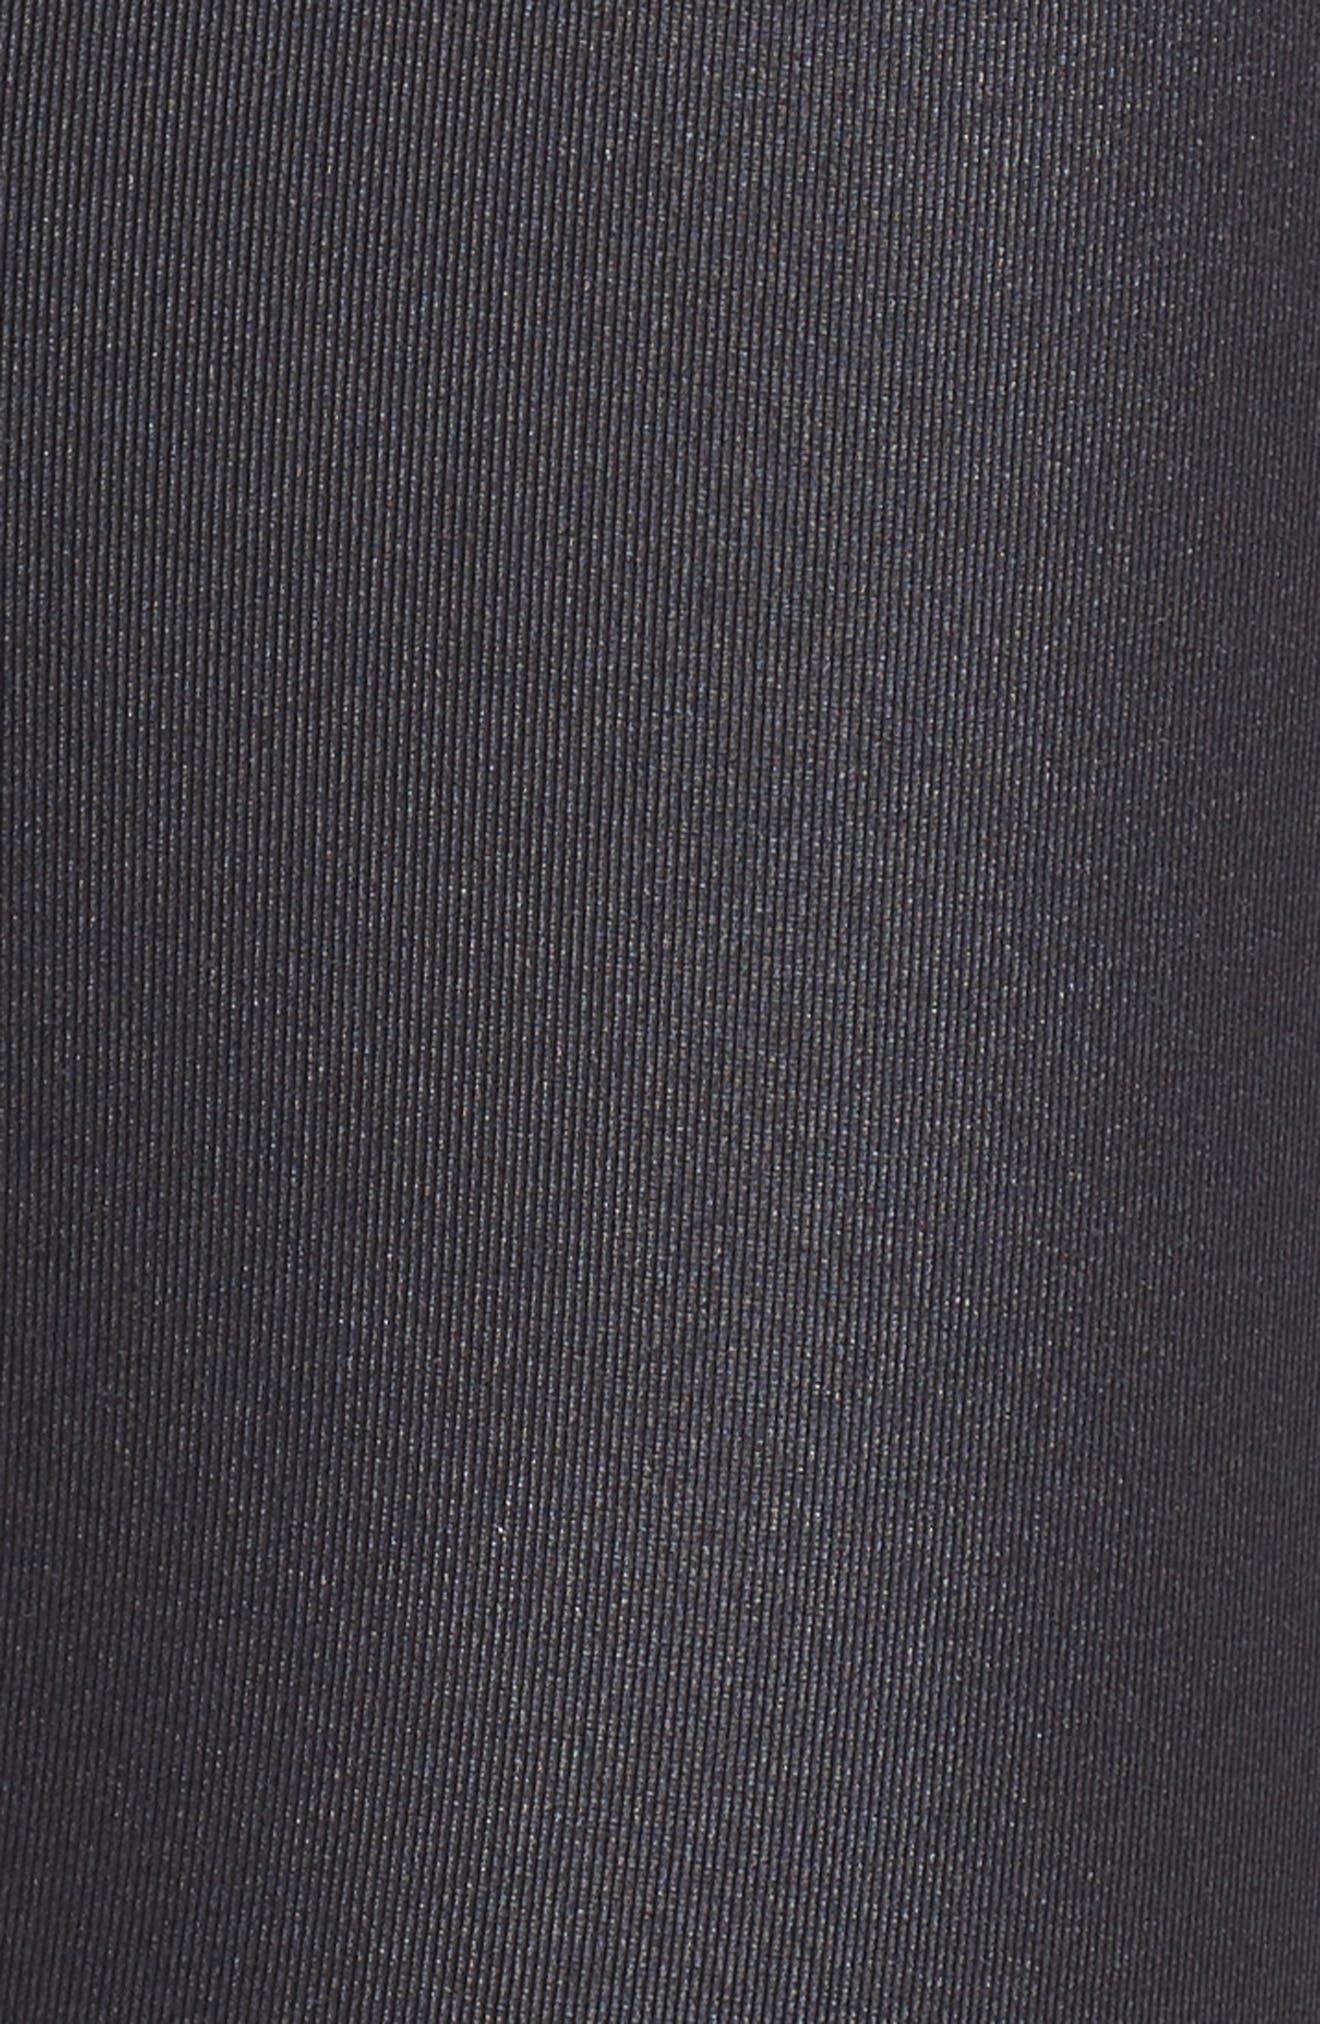 ALO, Airbrush 7/8 High Waist Leggings, Alternate thumbnail 6, color, BLACK GLOSSY